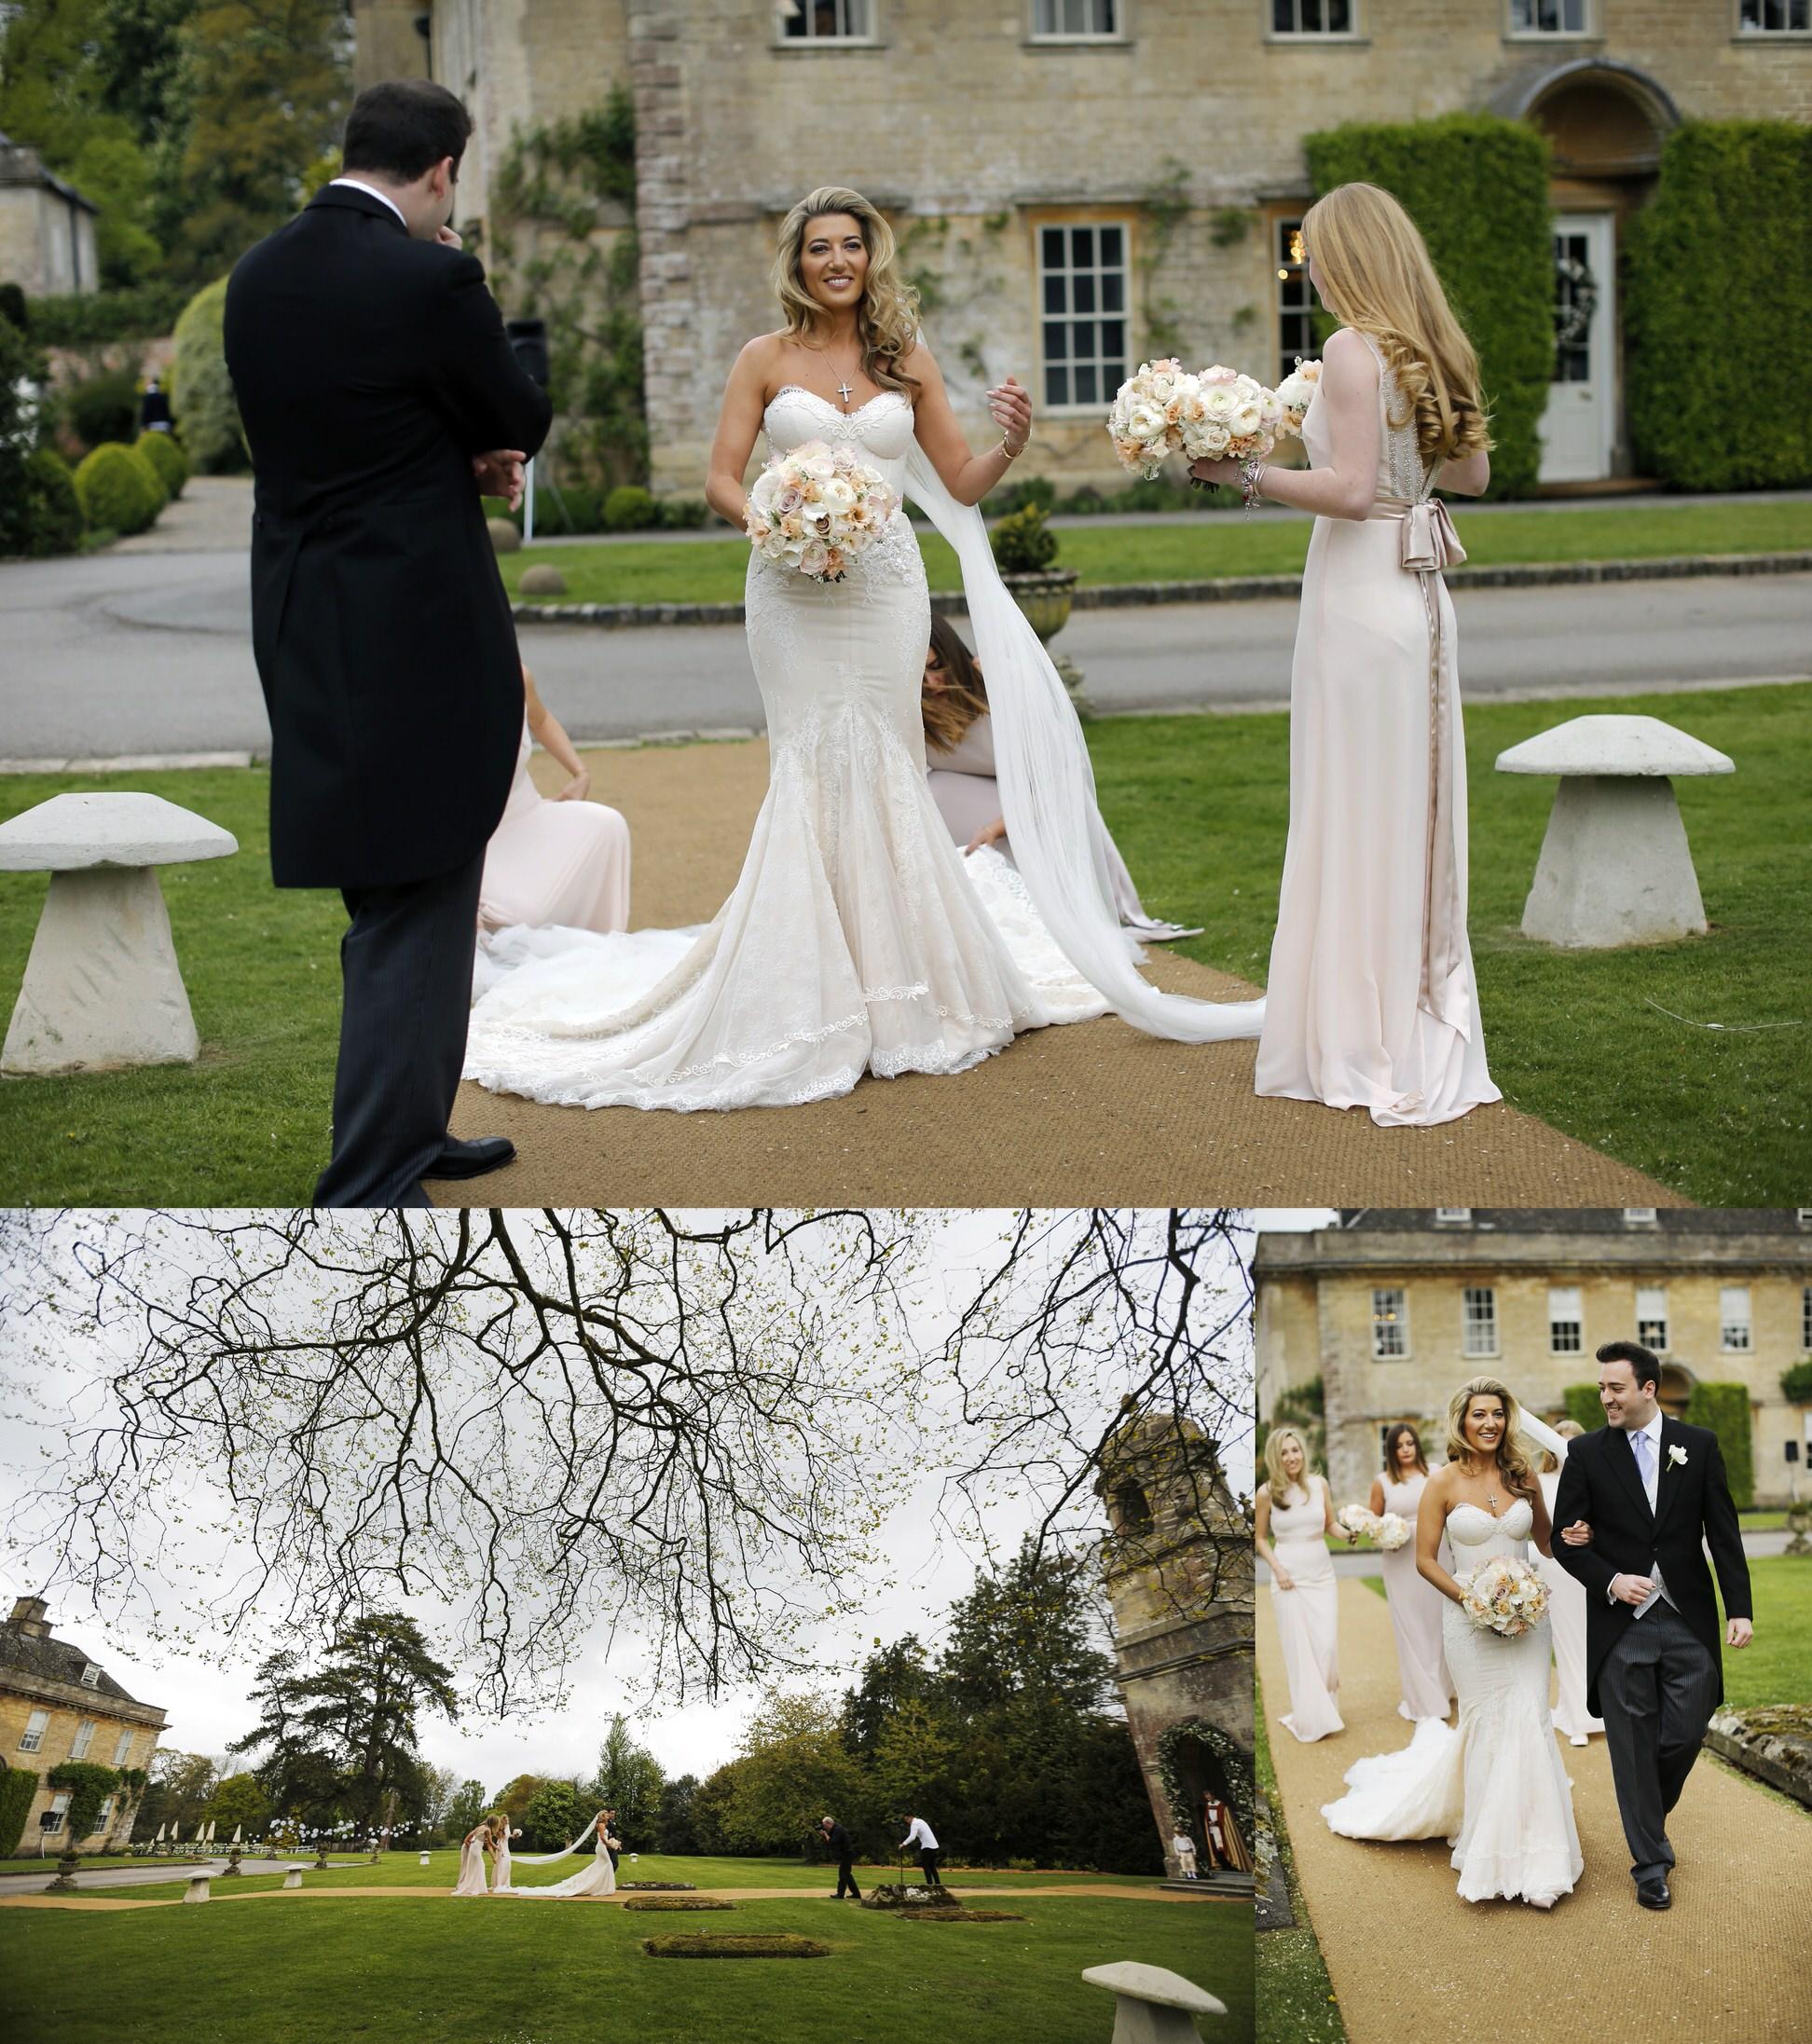 babington-house-wedding-at-soho-house-london-wedding-photographer_0009.jpg